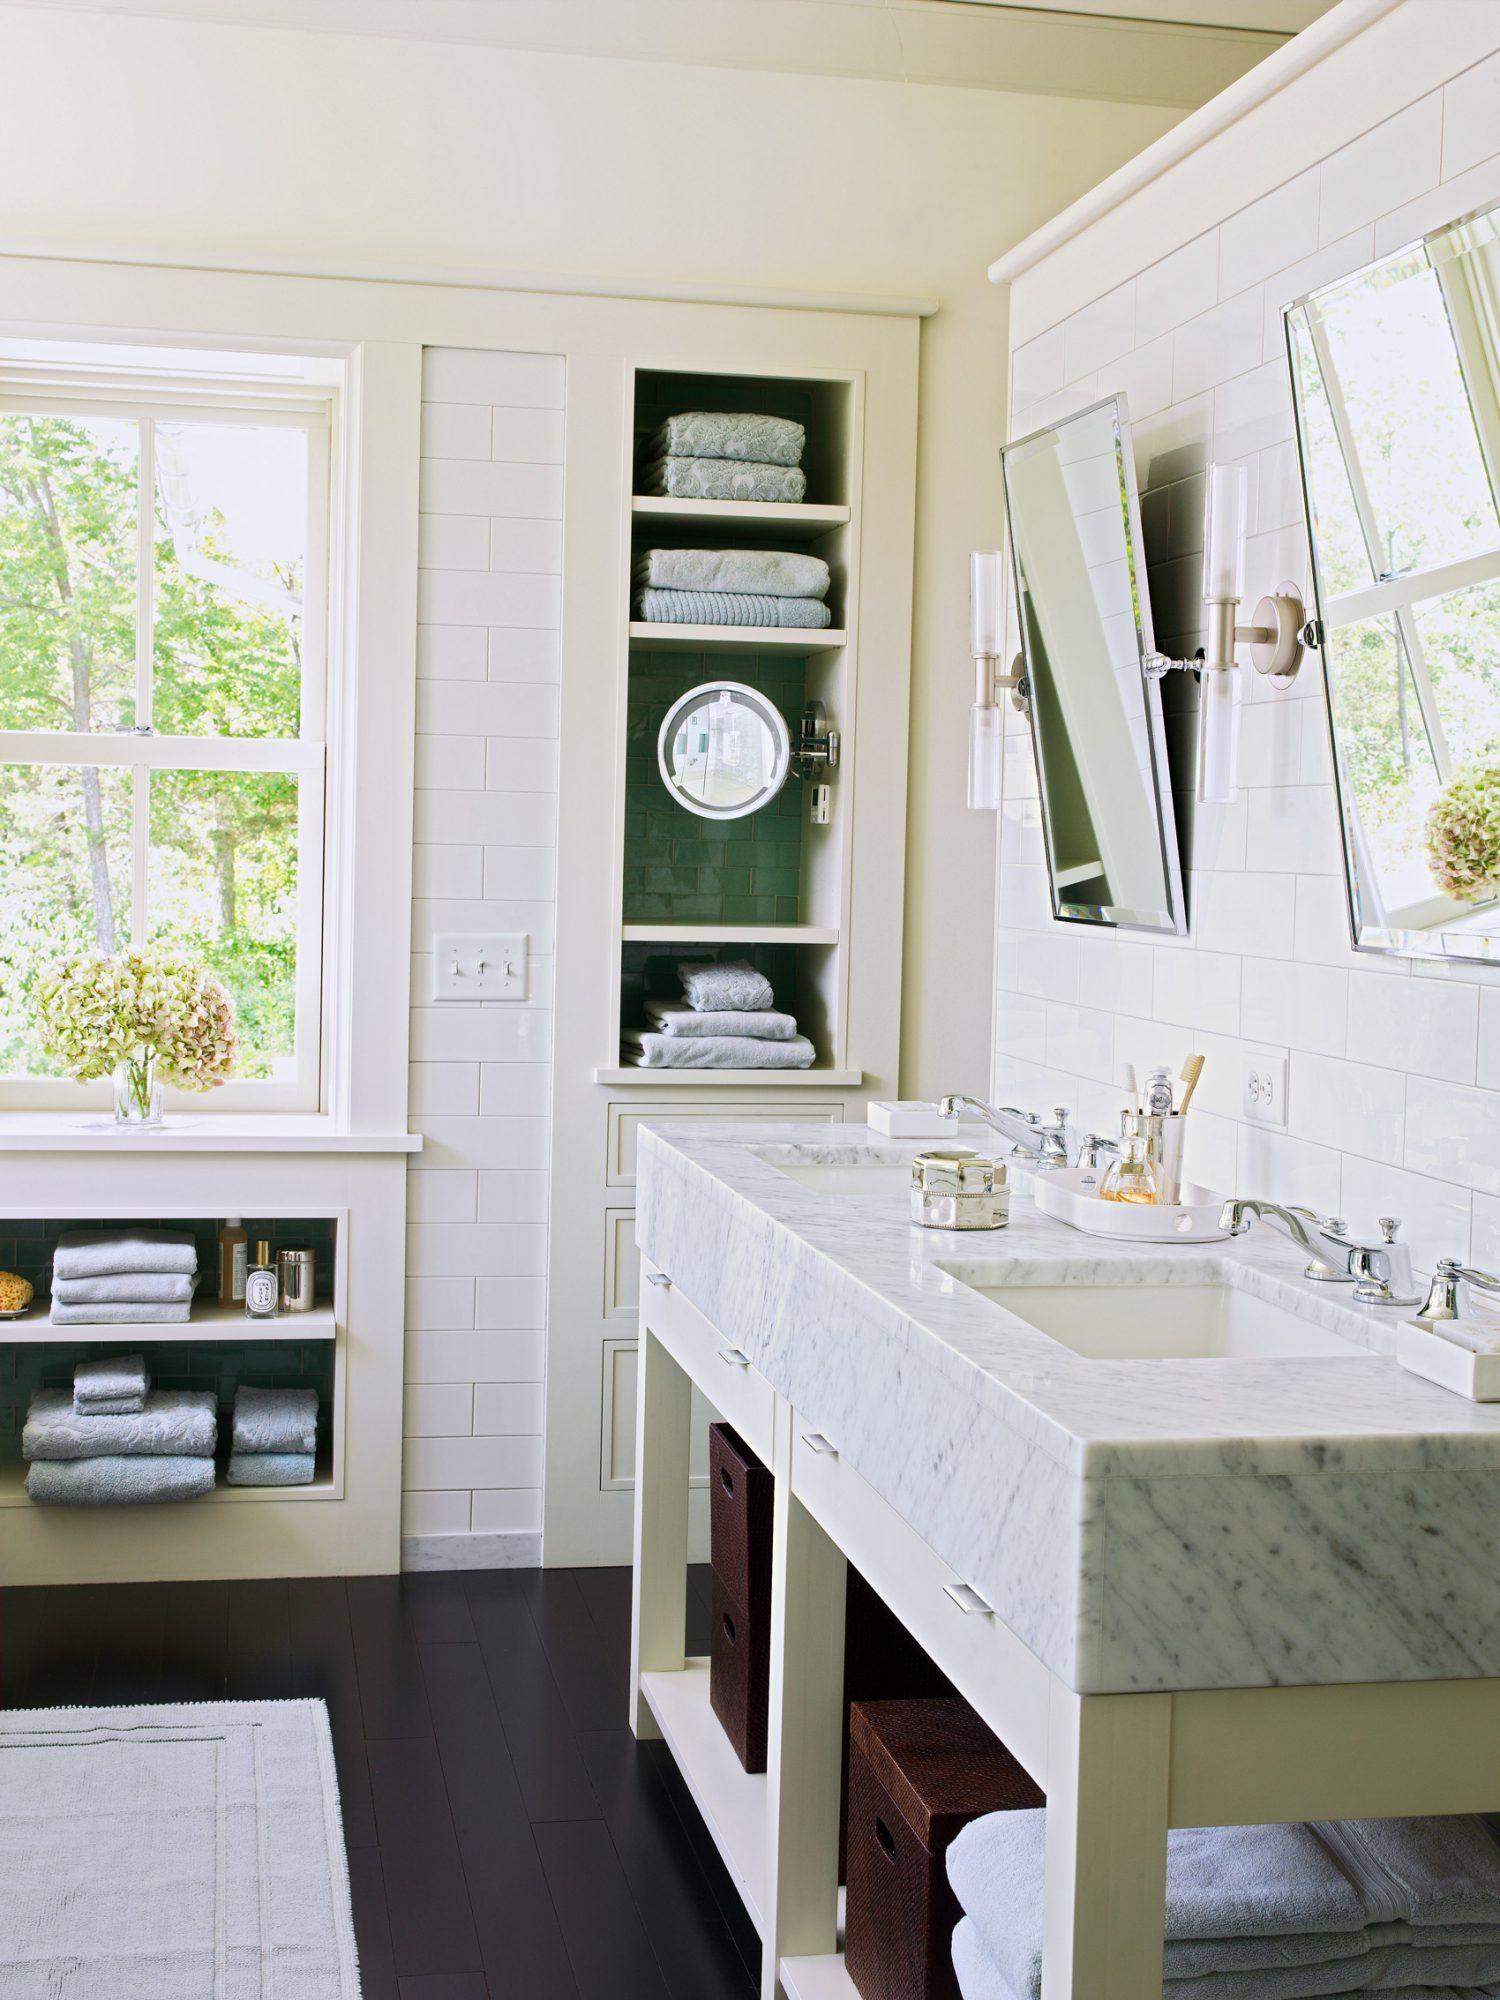 28 Towel Display Ideas For Pretty And Practical Bathroom Storage Bathroom Design Modern Bathroom Bathroom Countertops